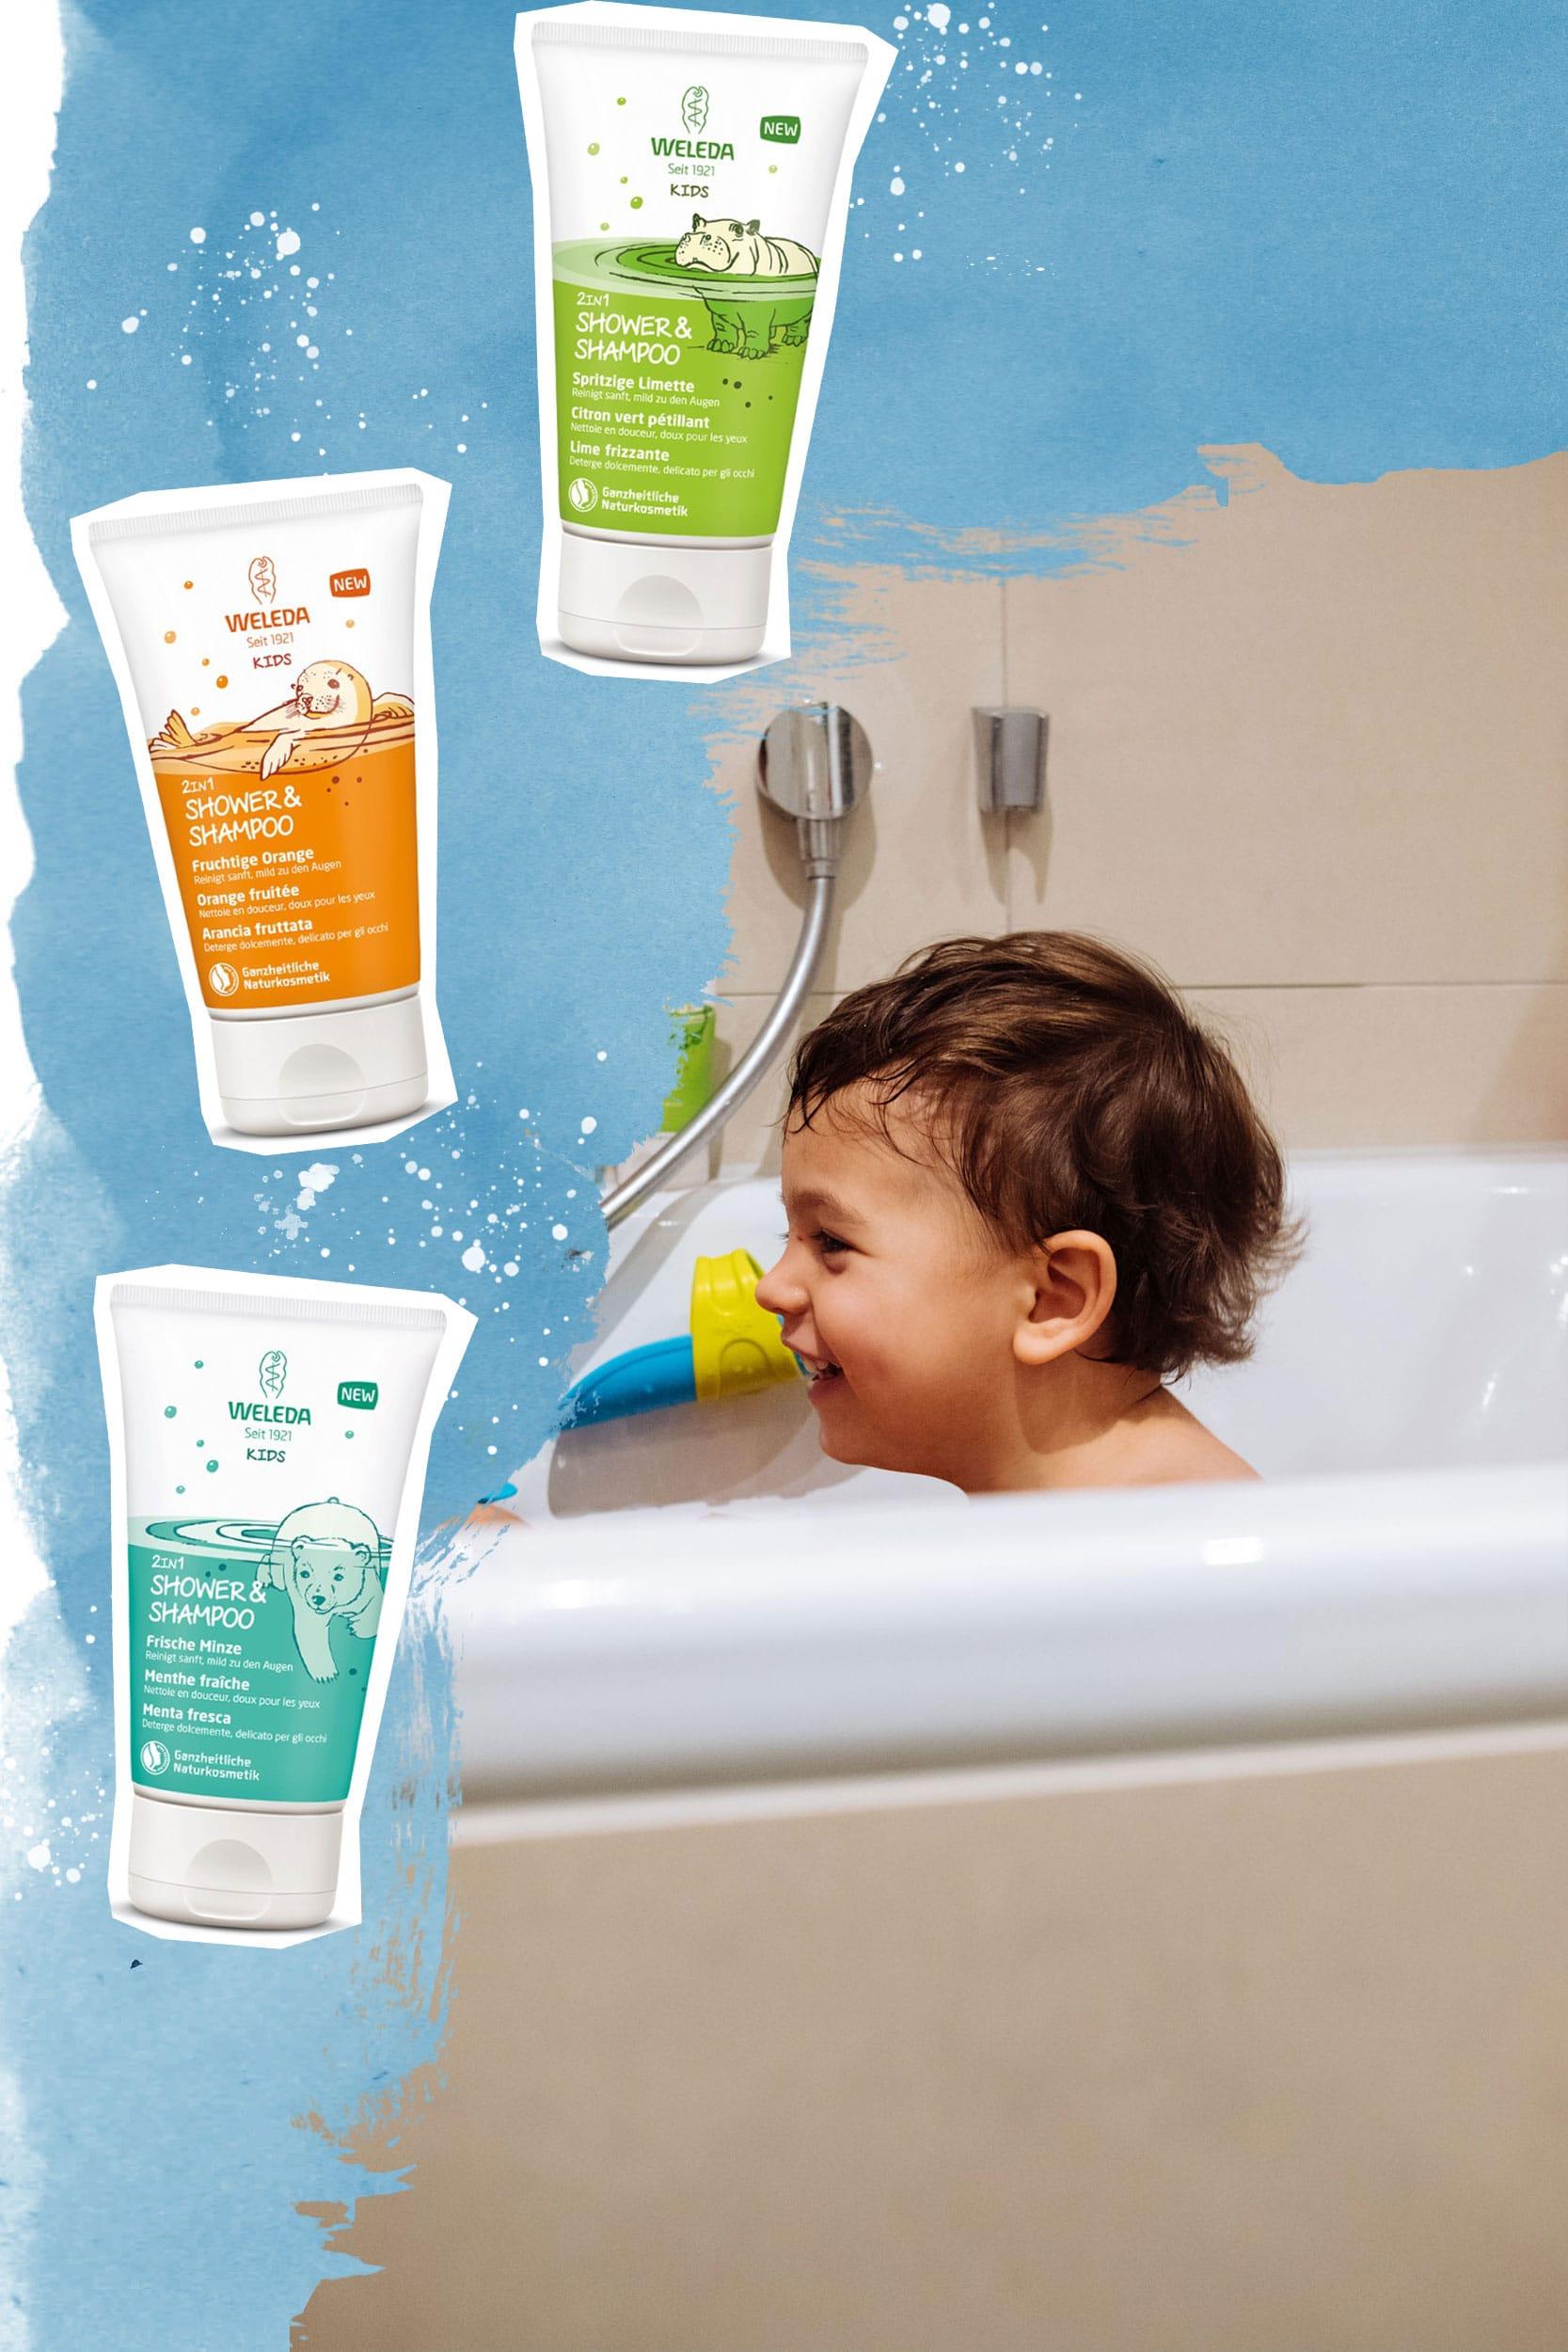 Weleda KIDS 2 in 1 Shower & Shampoo